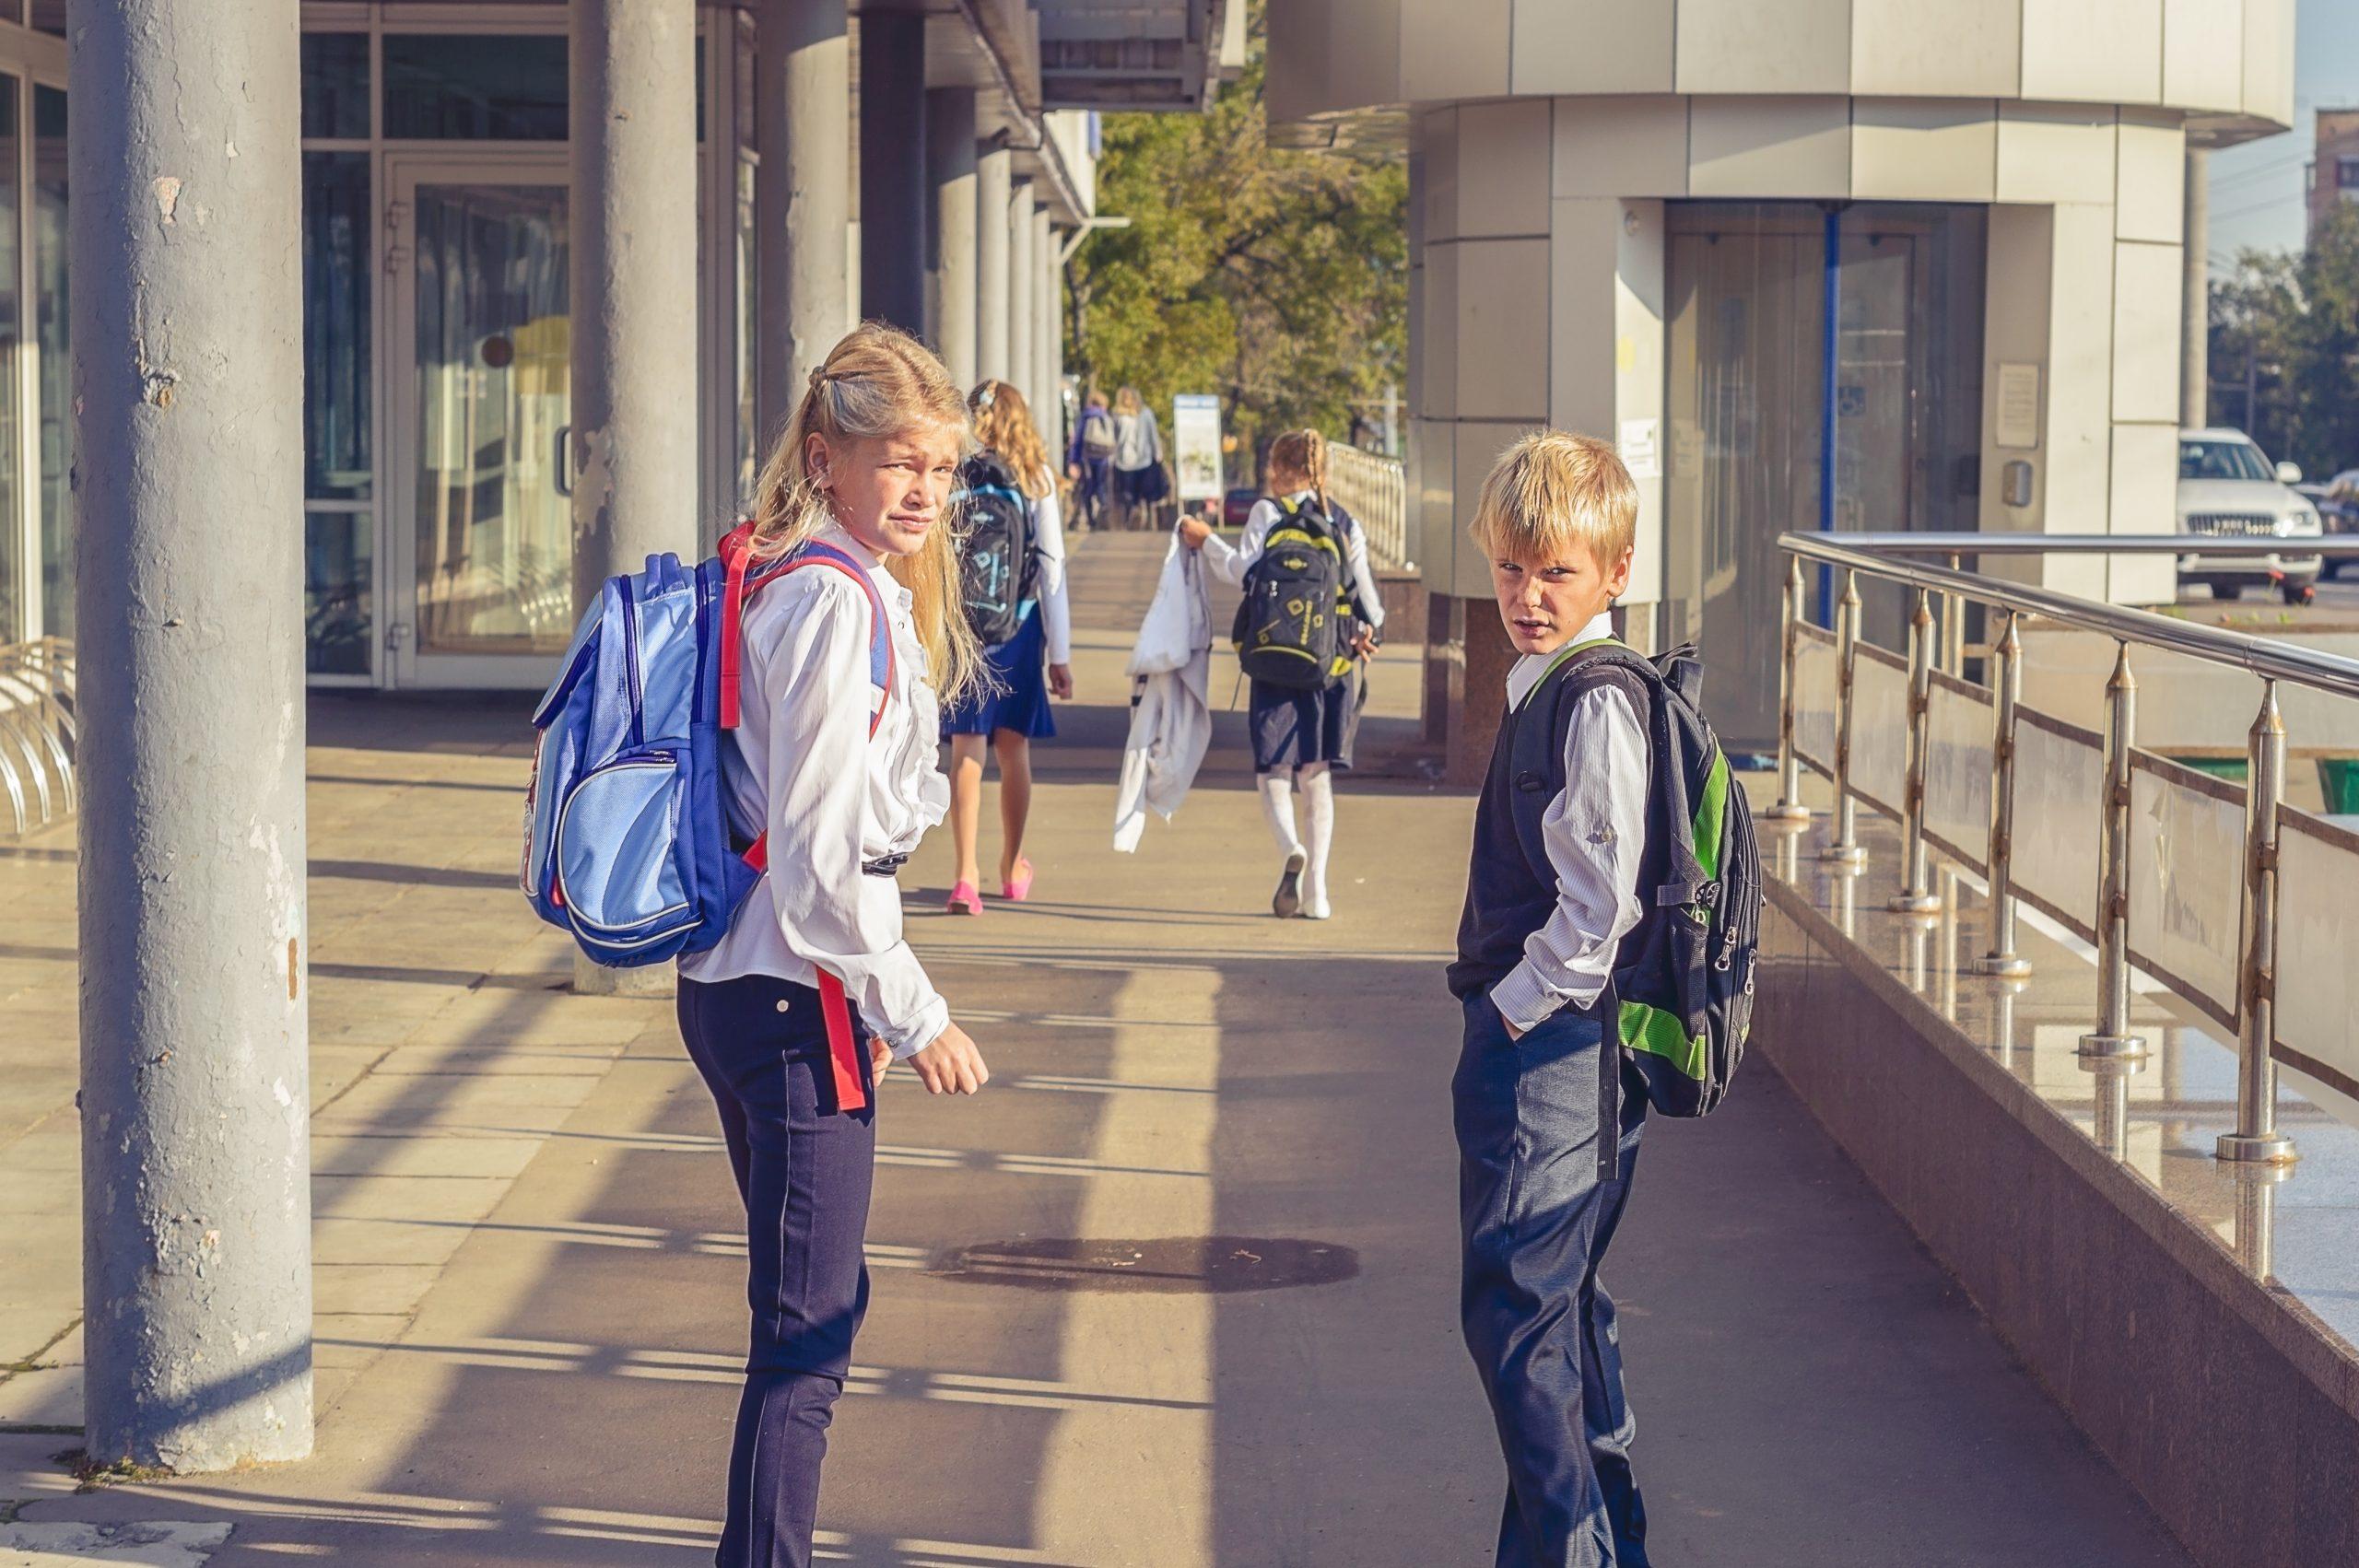 gezinsbegeleiding|Steur Training & Begeleiding